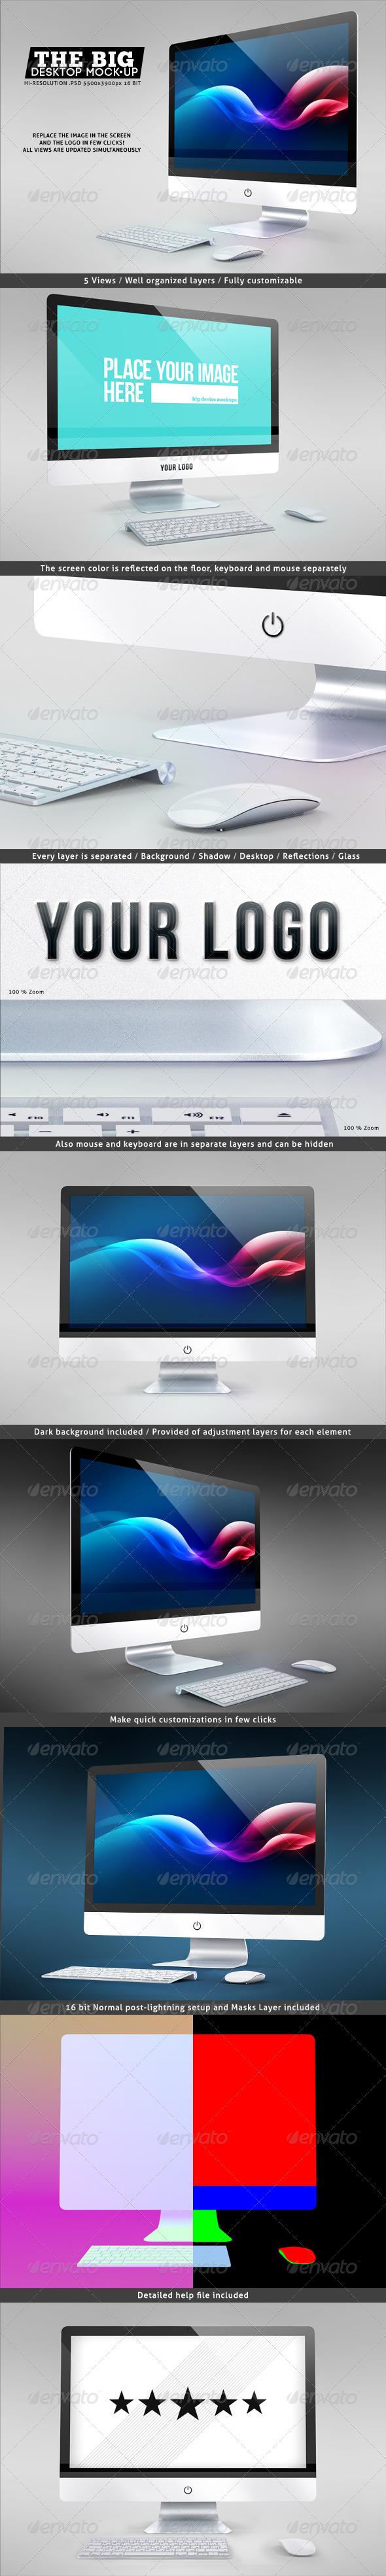 GraphicRiver The Big Desktop Screen Mock-up 7517221